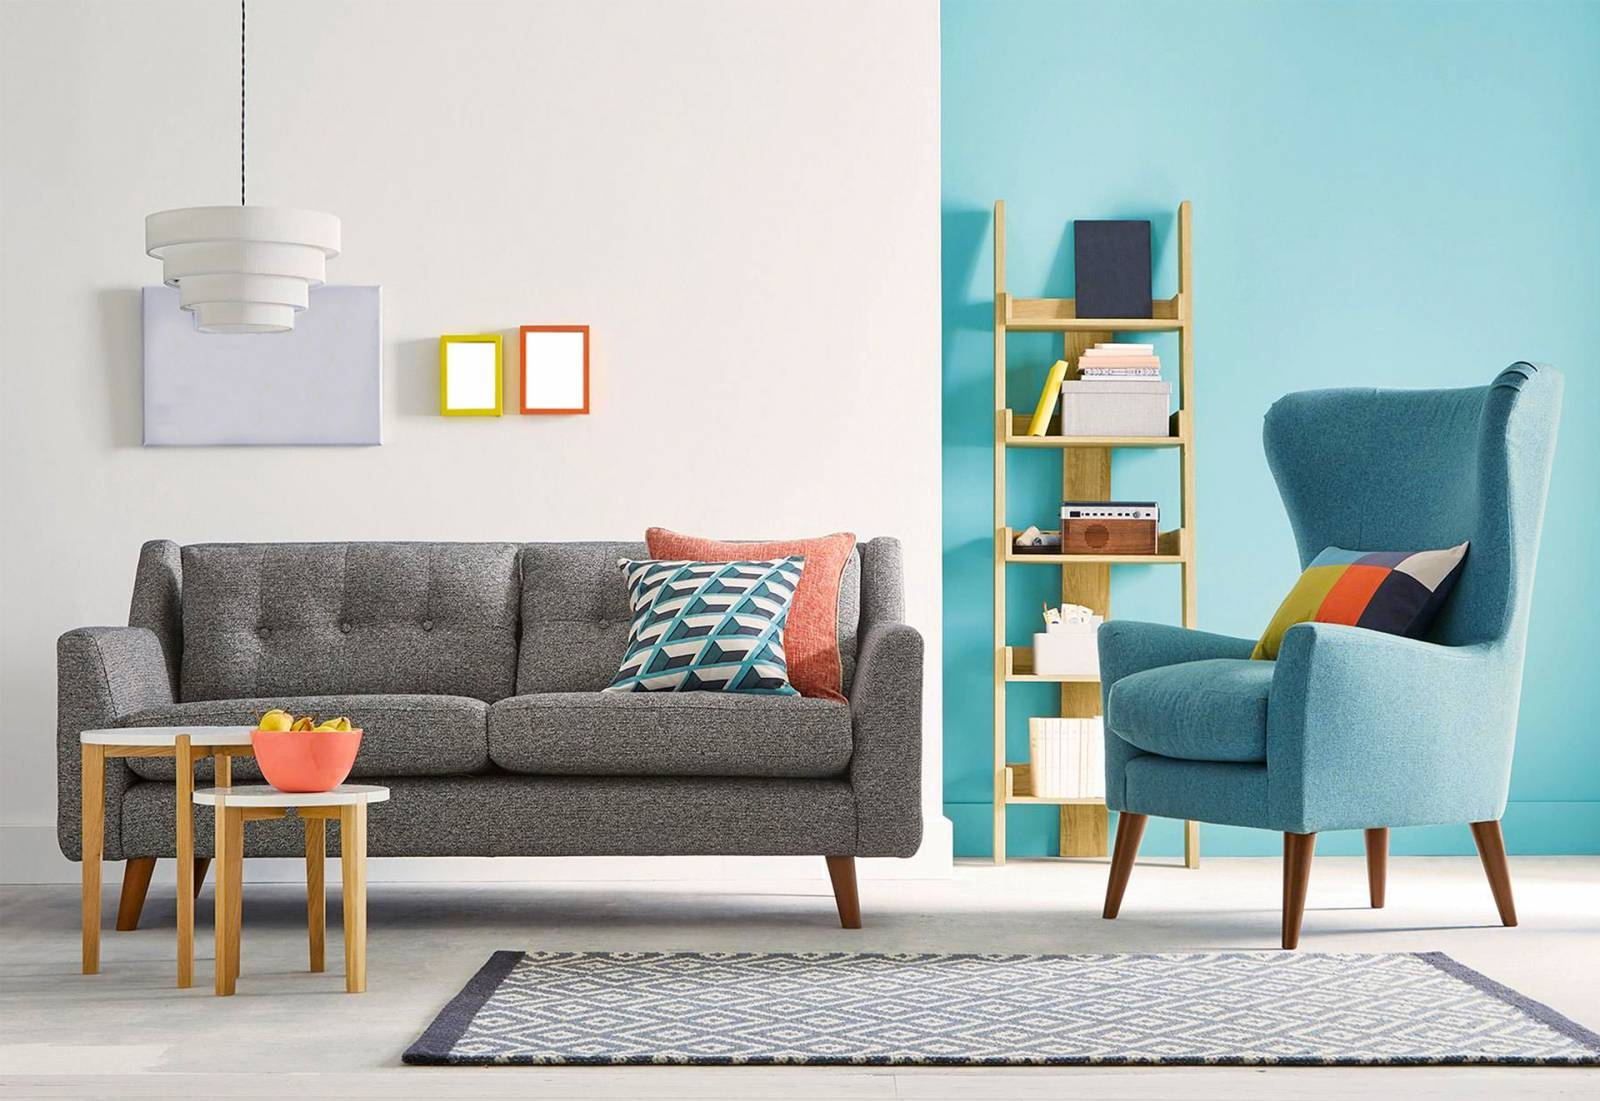 peinture en b timent ravalement de fa ade marignane vald s fr res. Black Bedroom Furniture Sets. Home Design Ideas